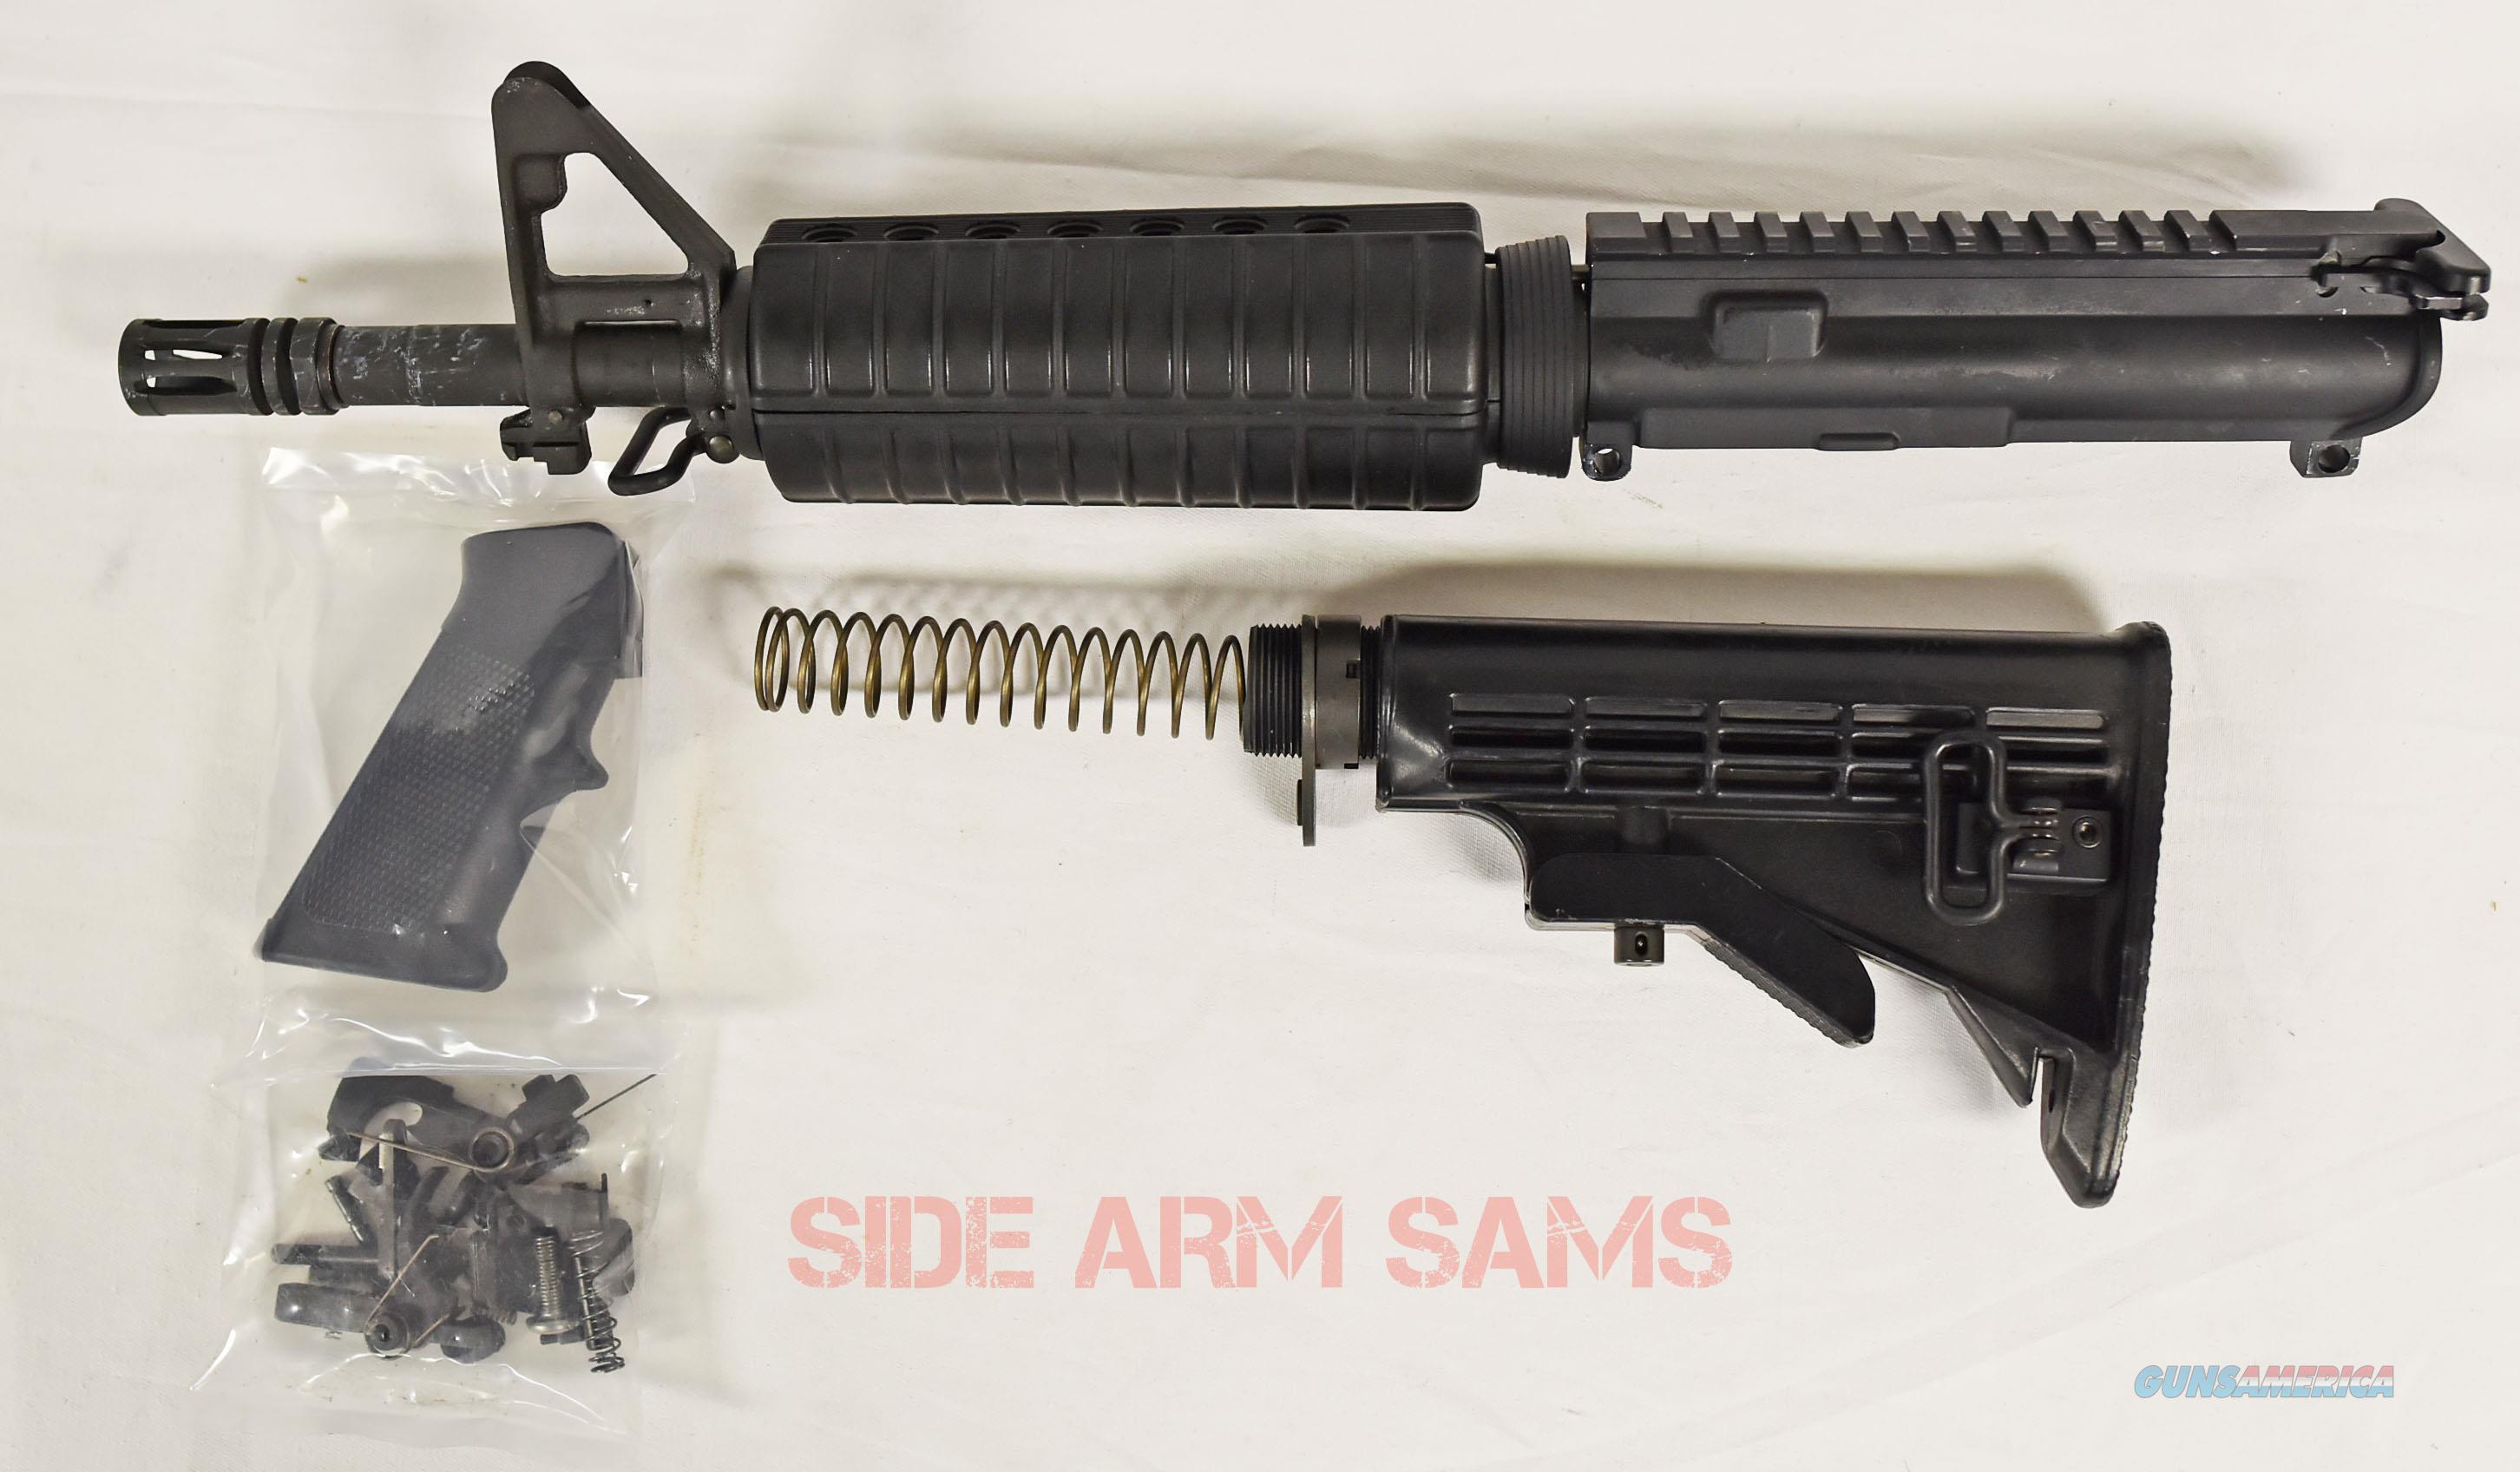 Used VG Bushmaster Complete Commando Upper & M16 LPK  Non-Guns > Gun Parts > M16-AR15 > Upper Only